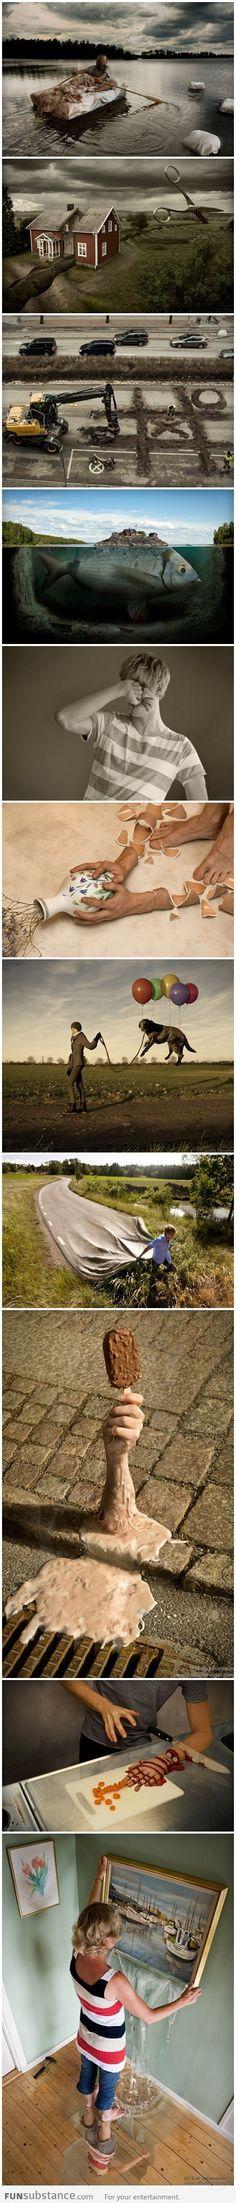 Amazing surrealistic digital art